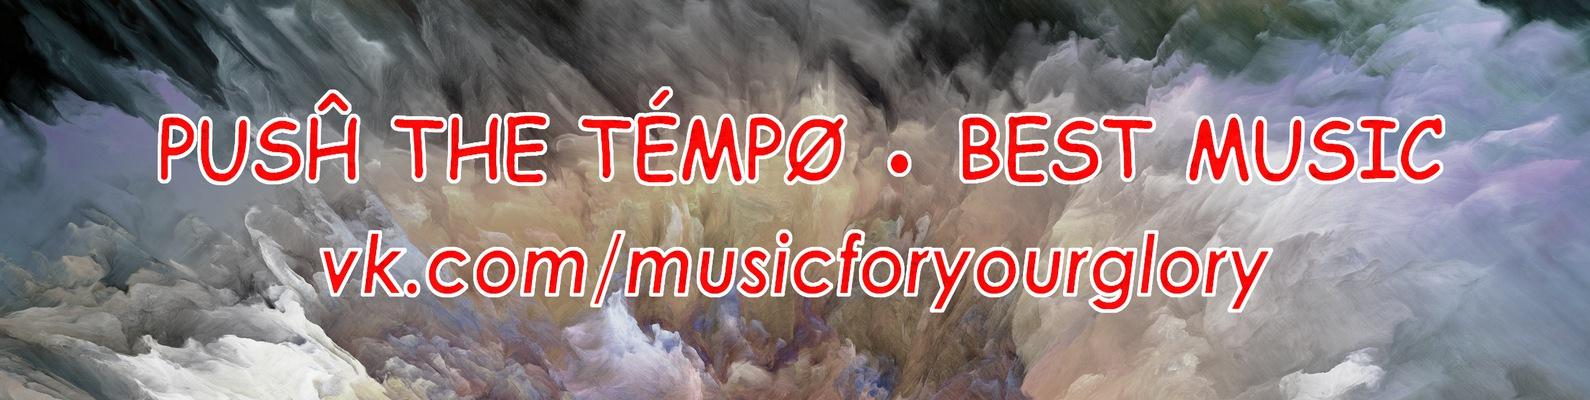 Pus the tmp best music vk malvernweather Gallery